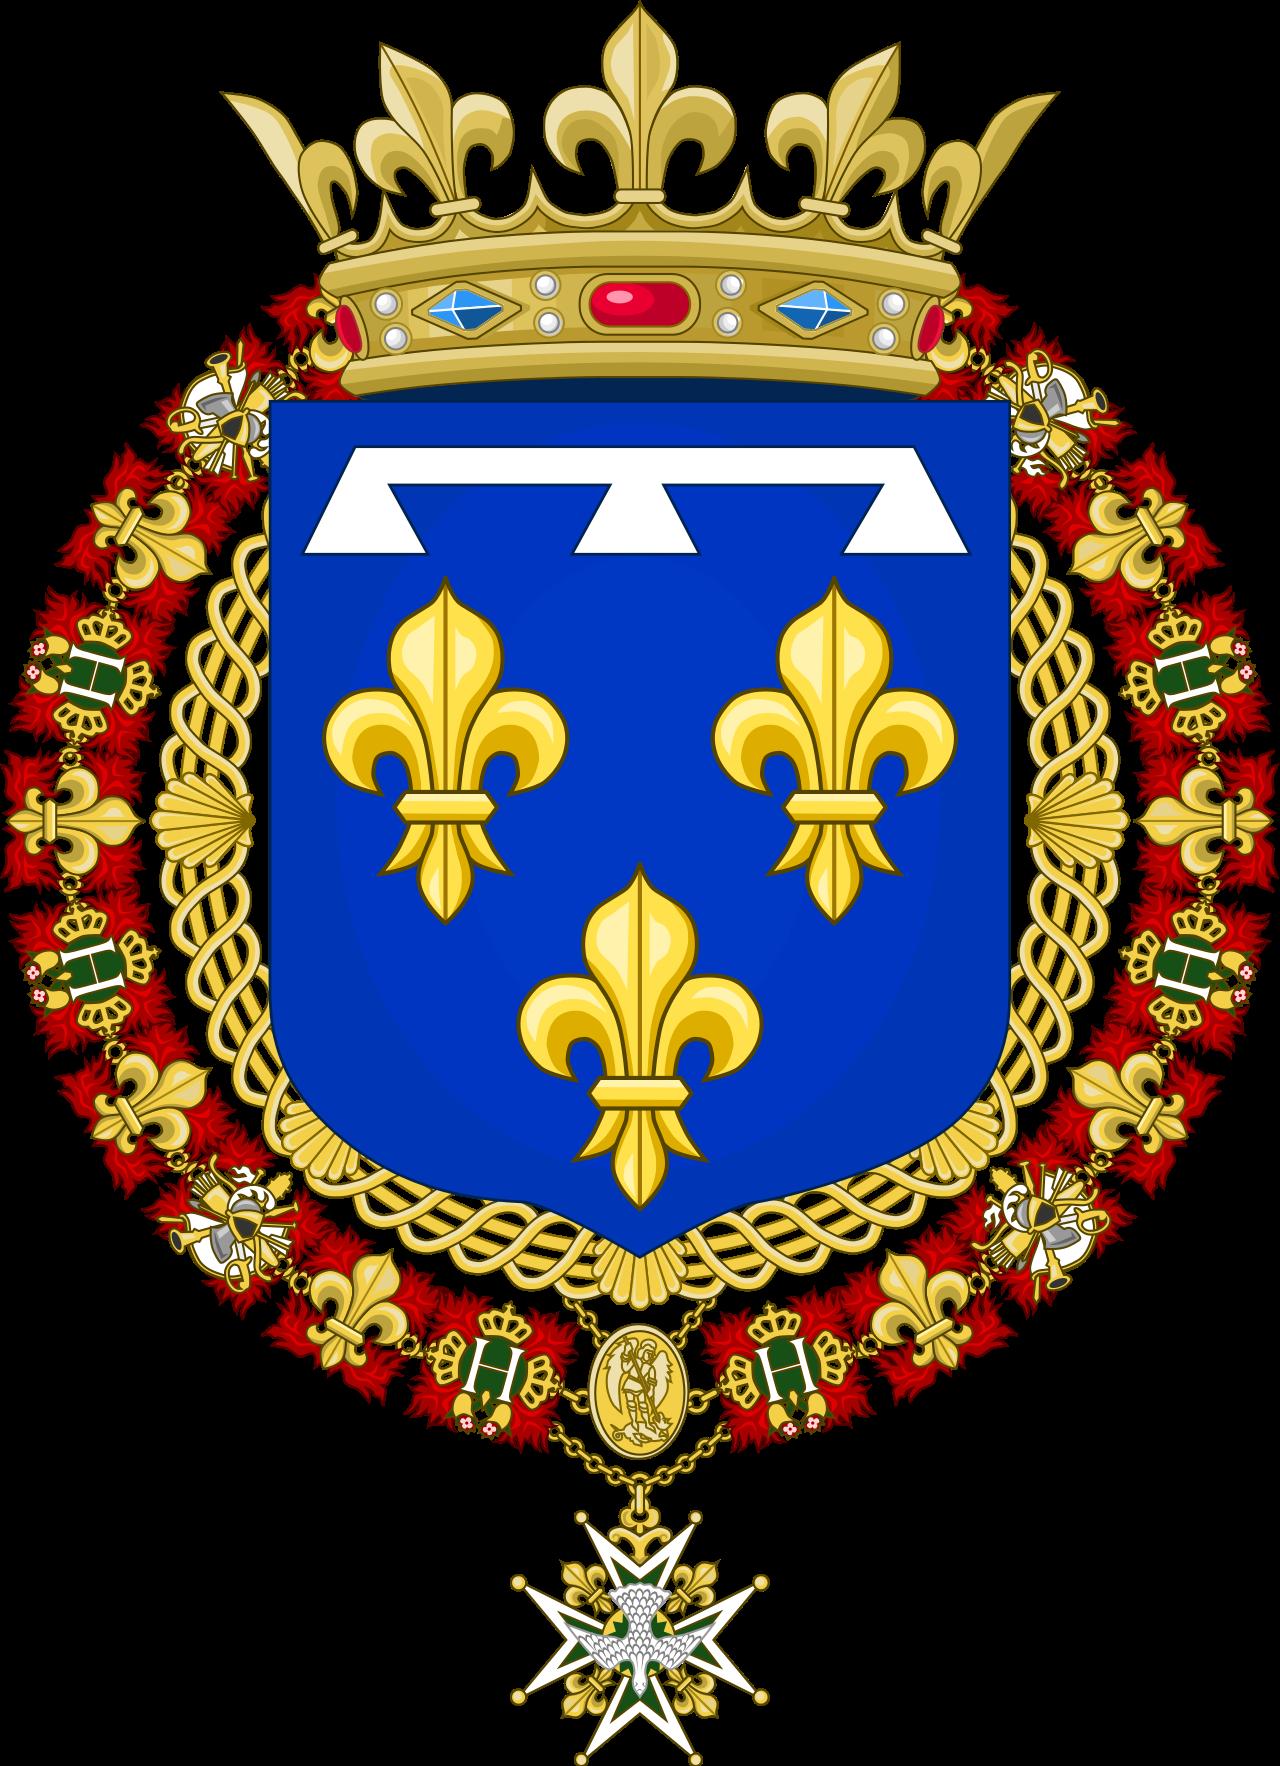 Risultati immagini per duke of orleans coat of arms